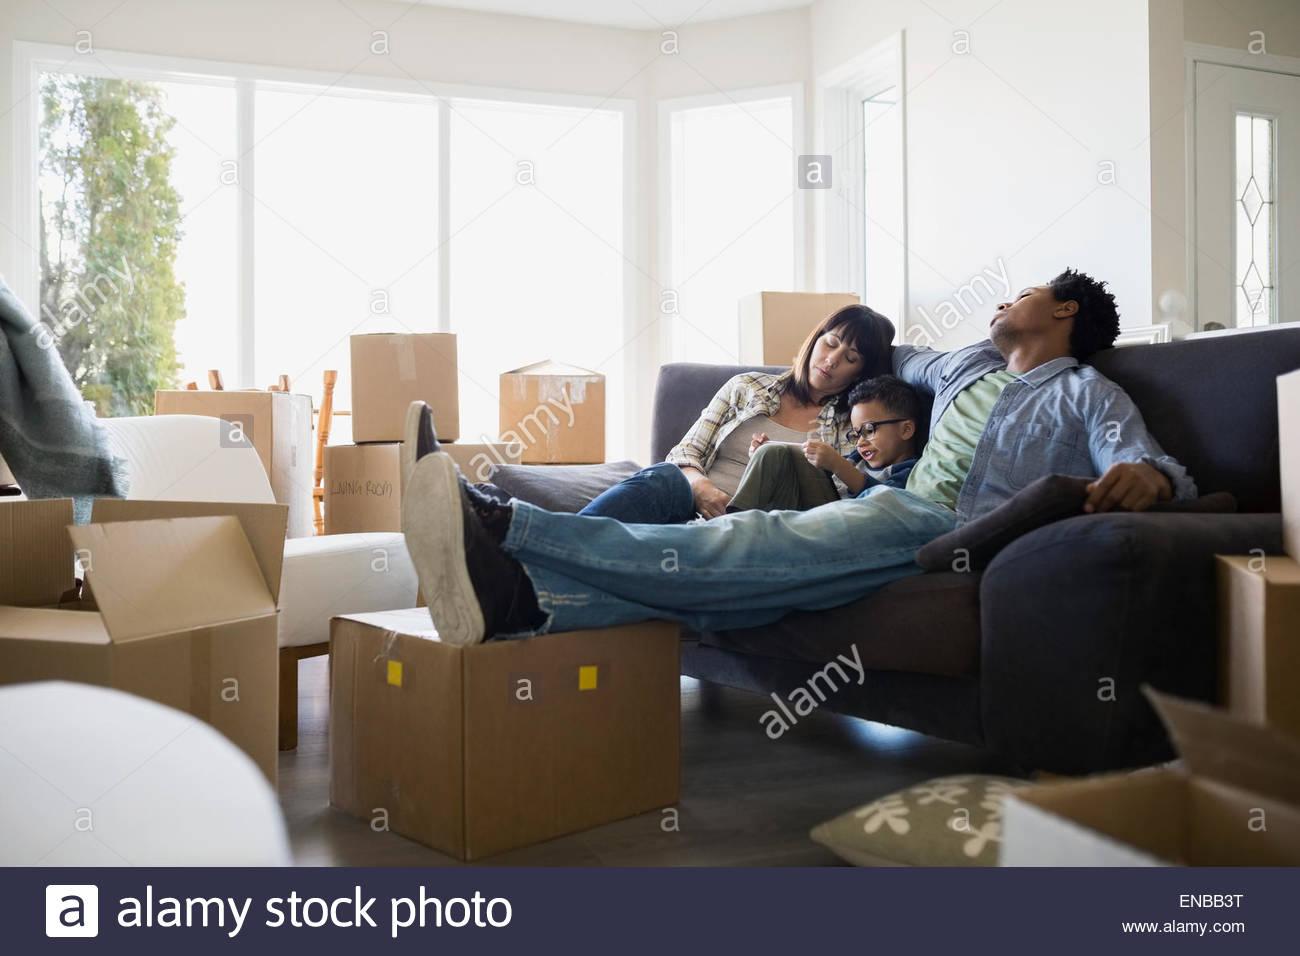 Moving boxes entourant family relaxing on sofa Photo Stock